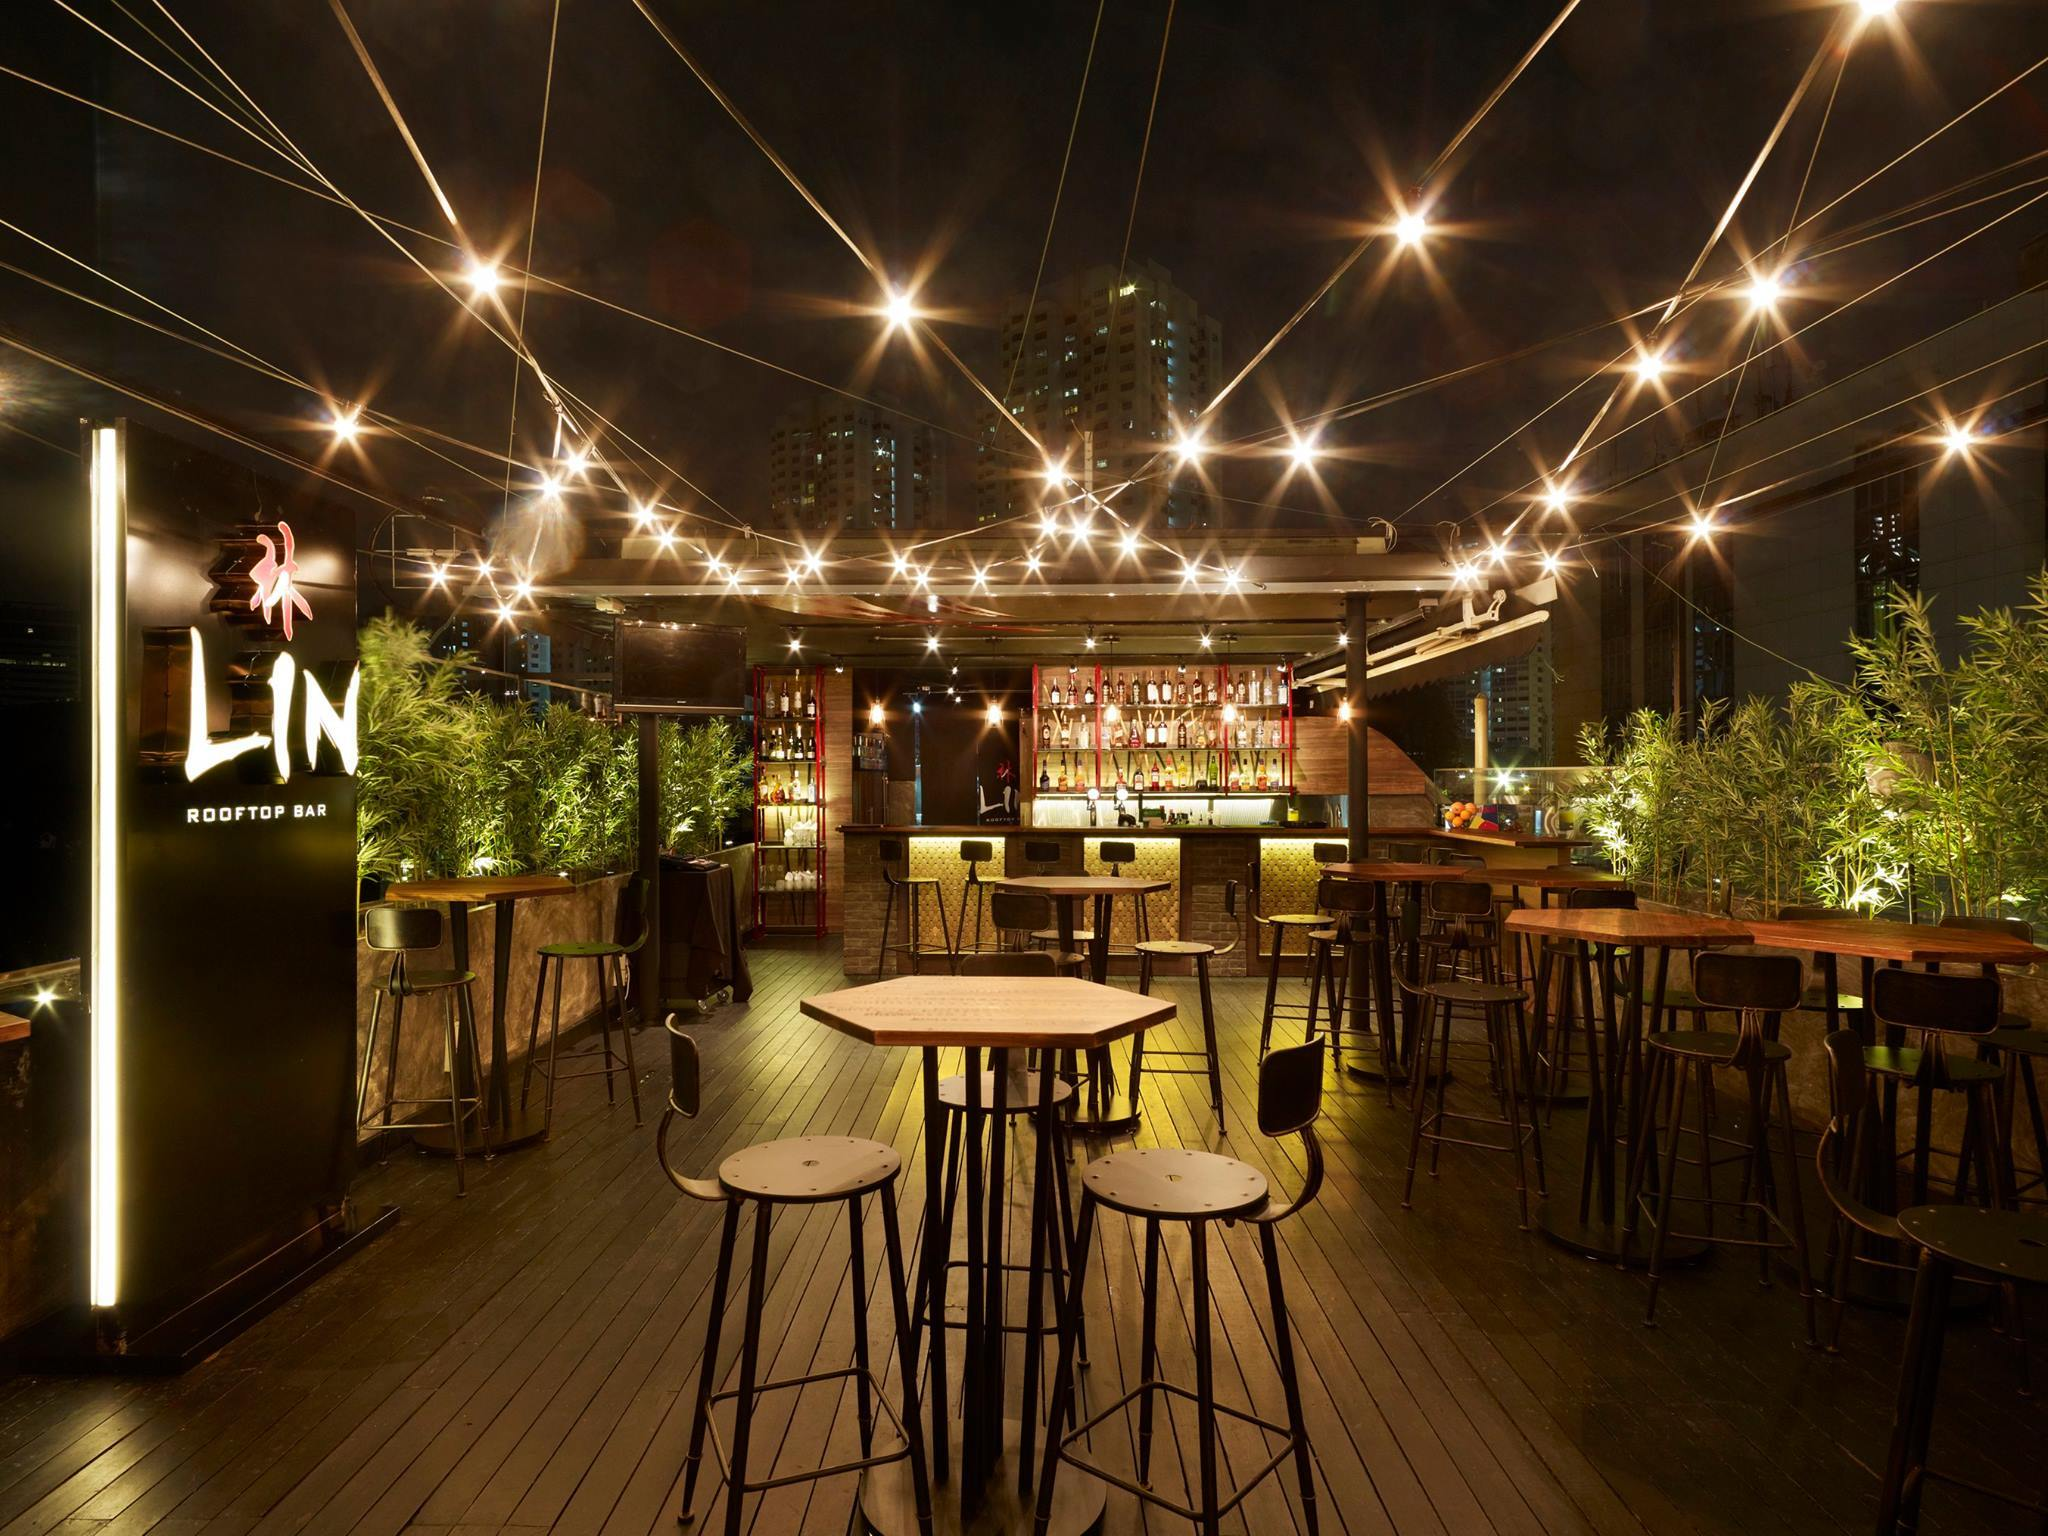 Lin Rooftop Bar  Restaurants in Tiong Bahru Singapore